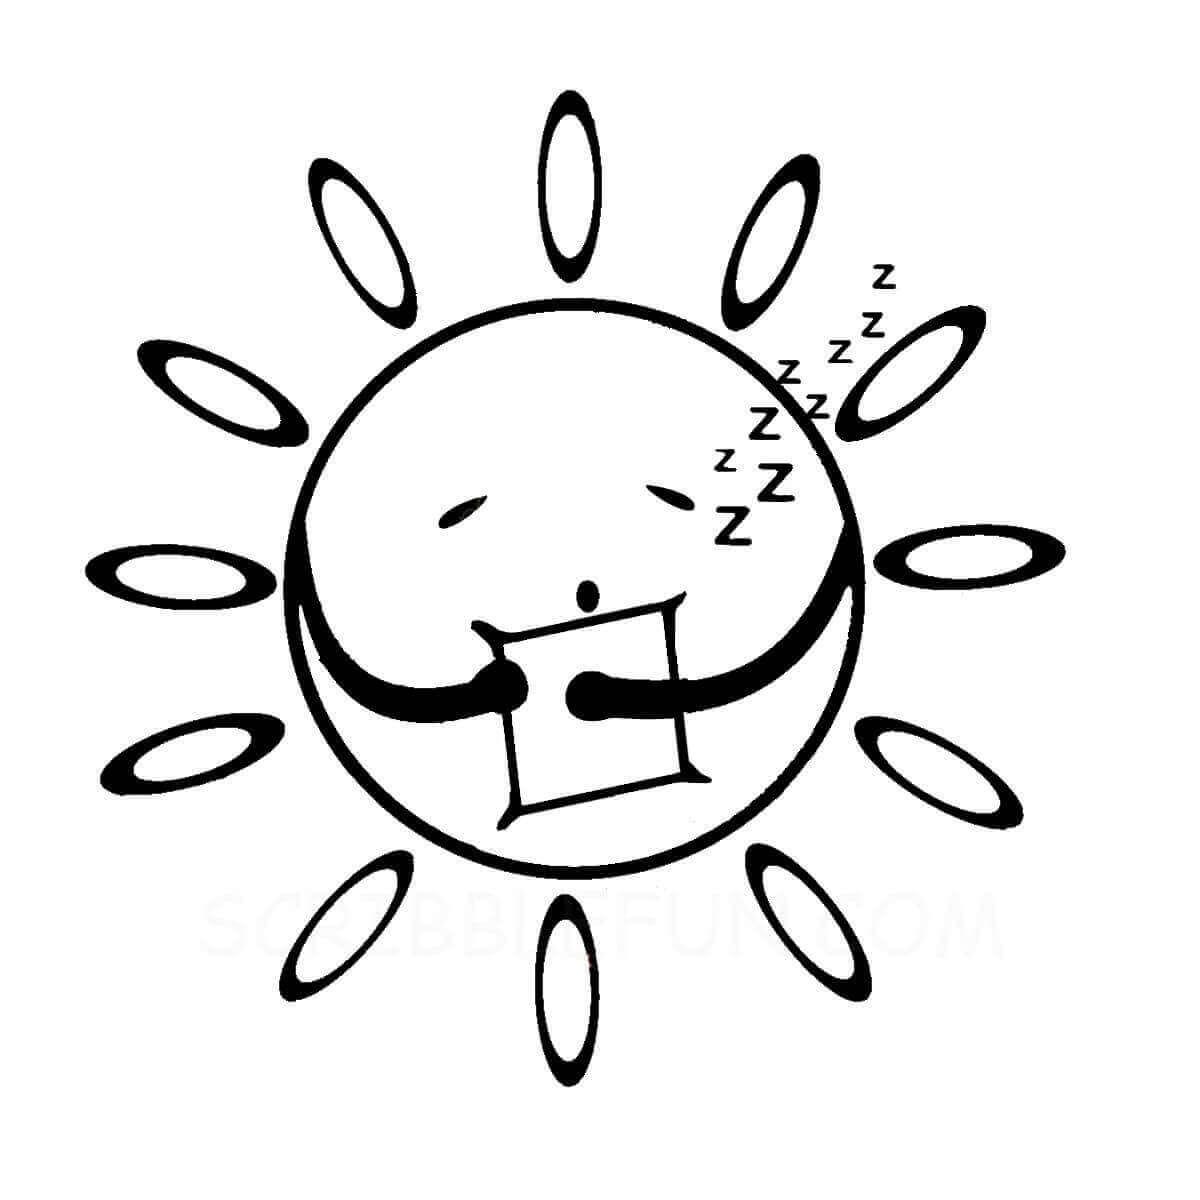 Sun sleeping colouring page